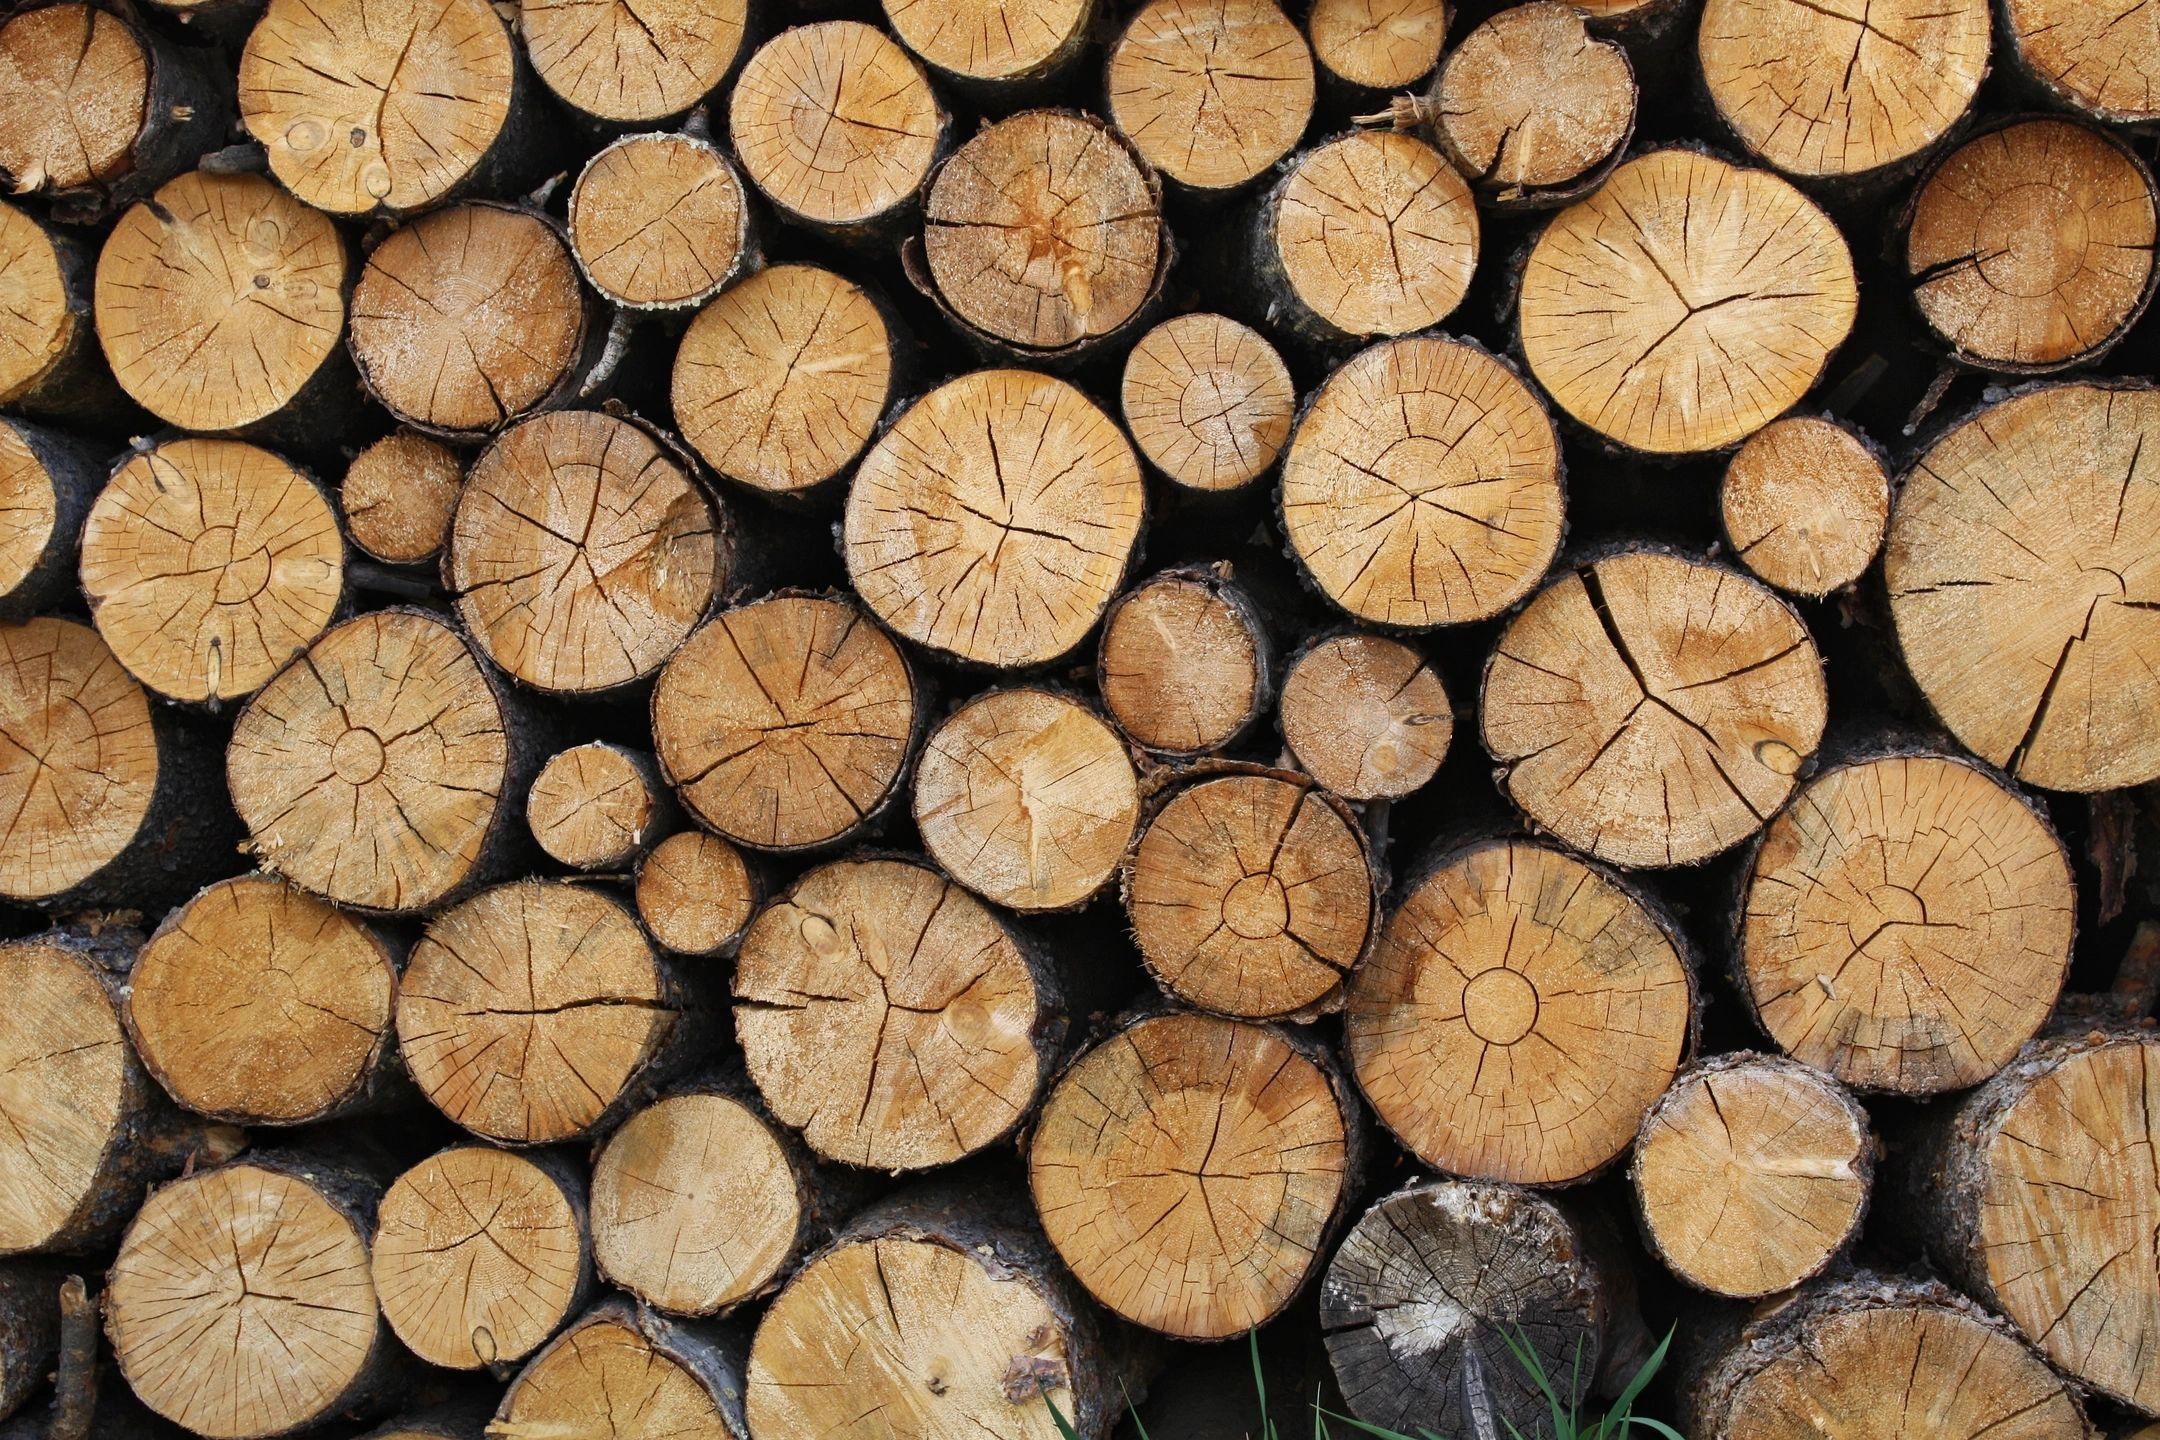 Billots de bois en corde